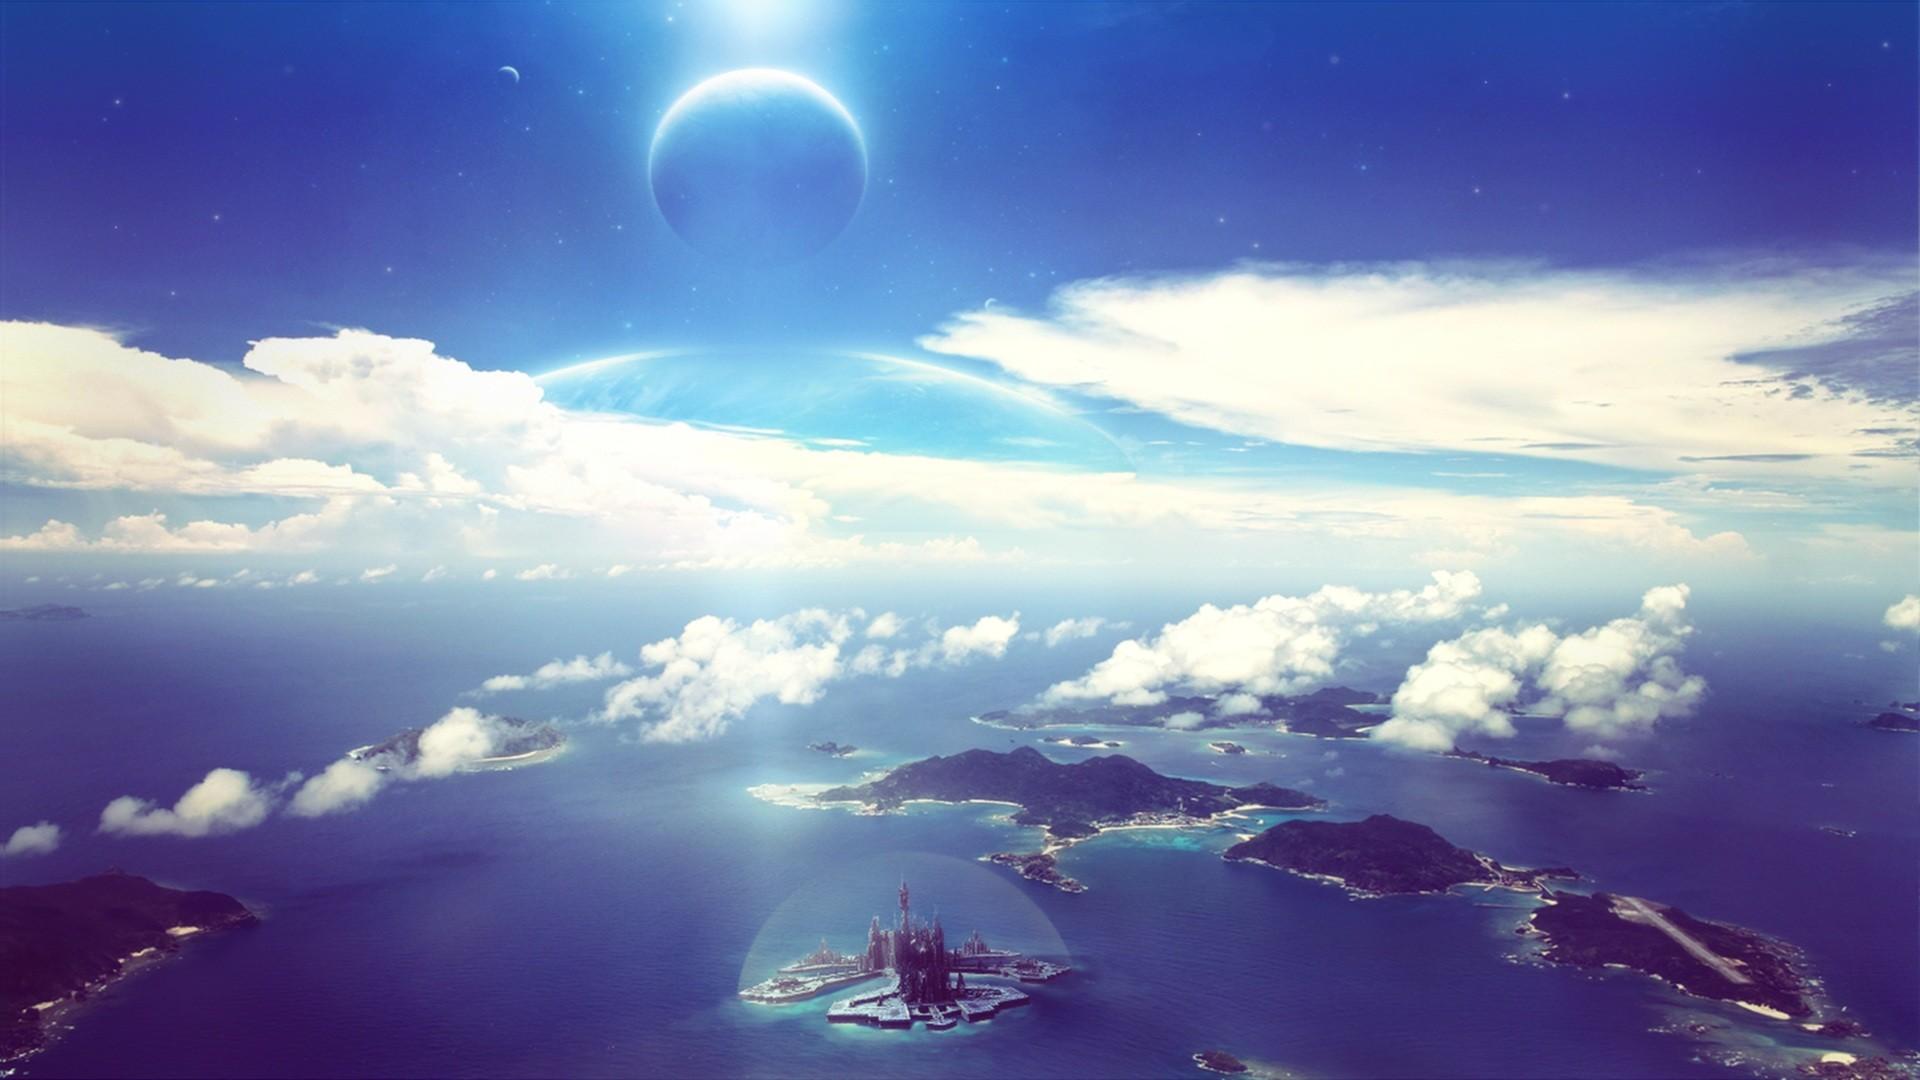 Sci Fi – Landscape Water Island Stargate Atlantis Stargate Sci Fi Wallpaper